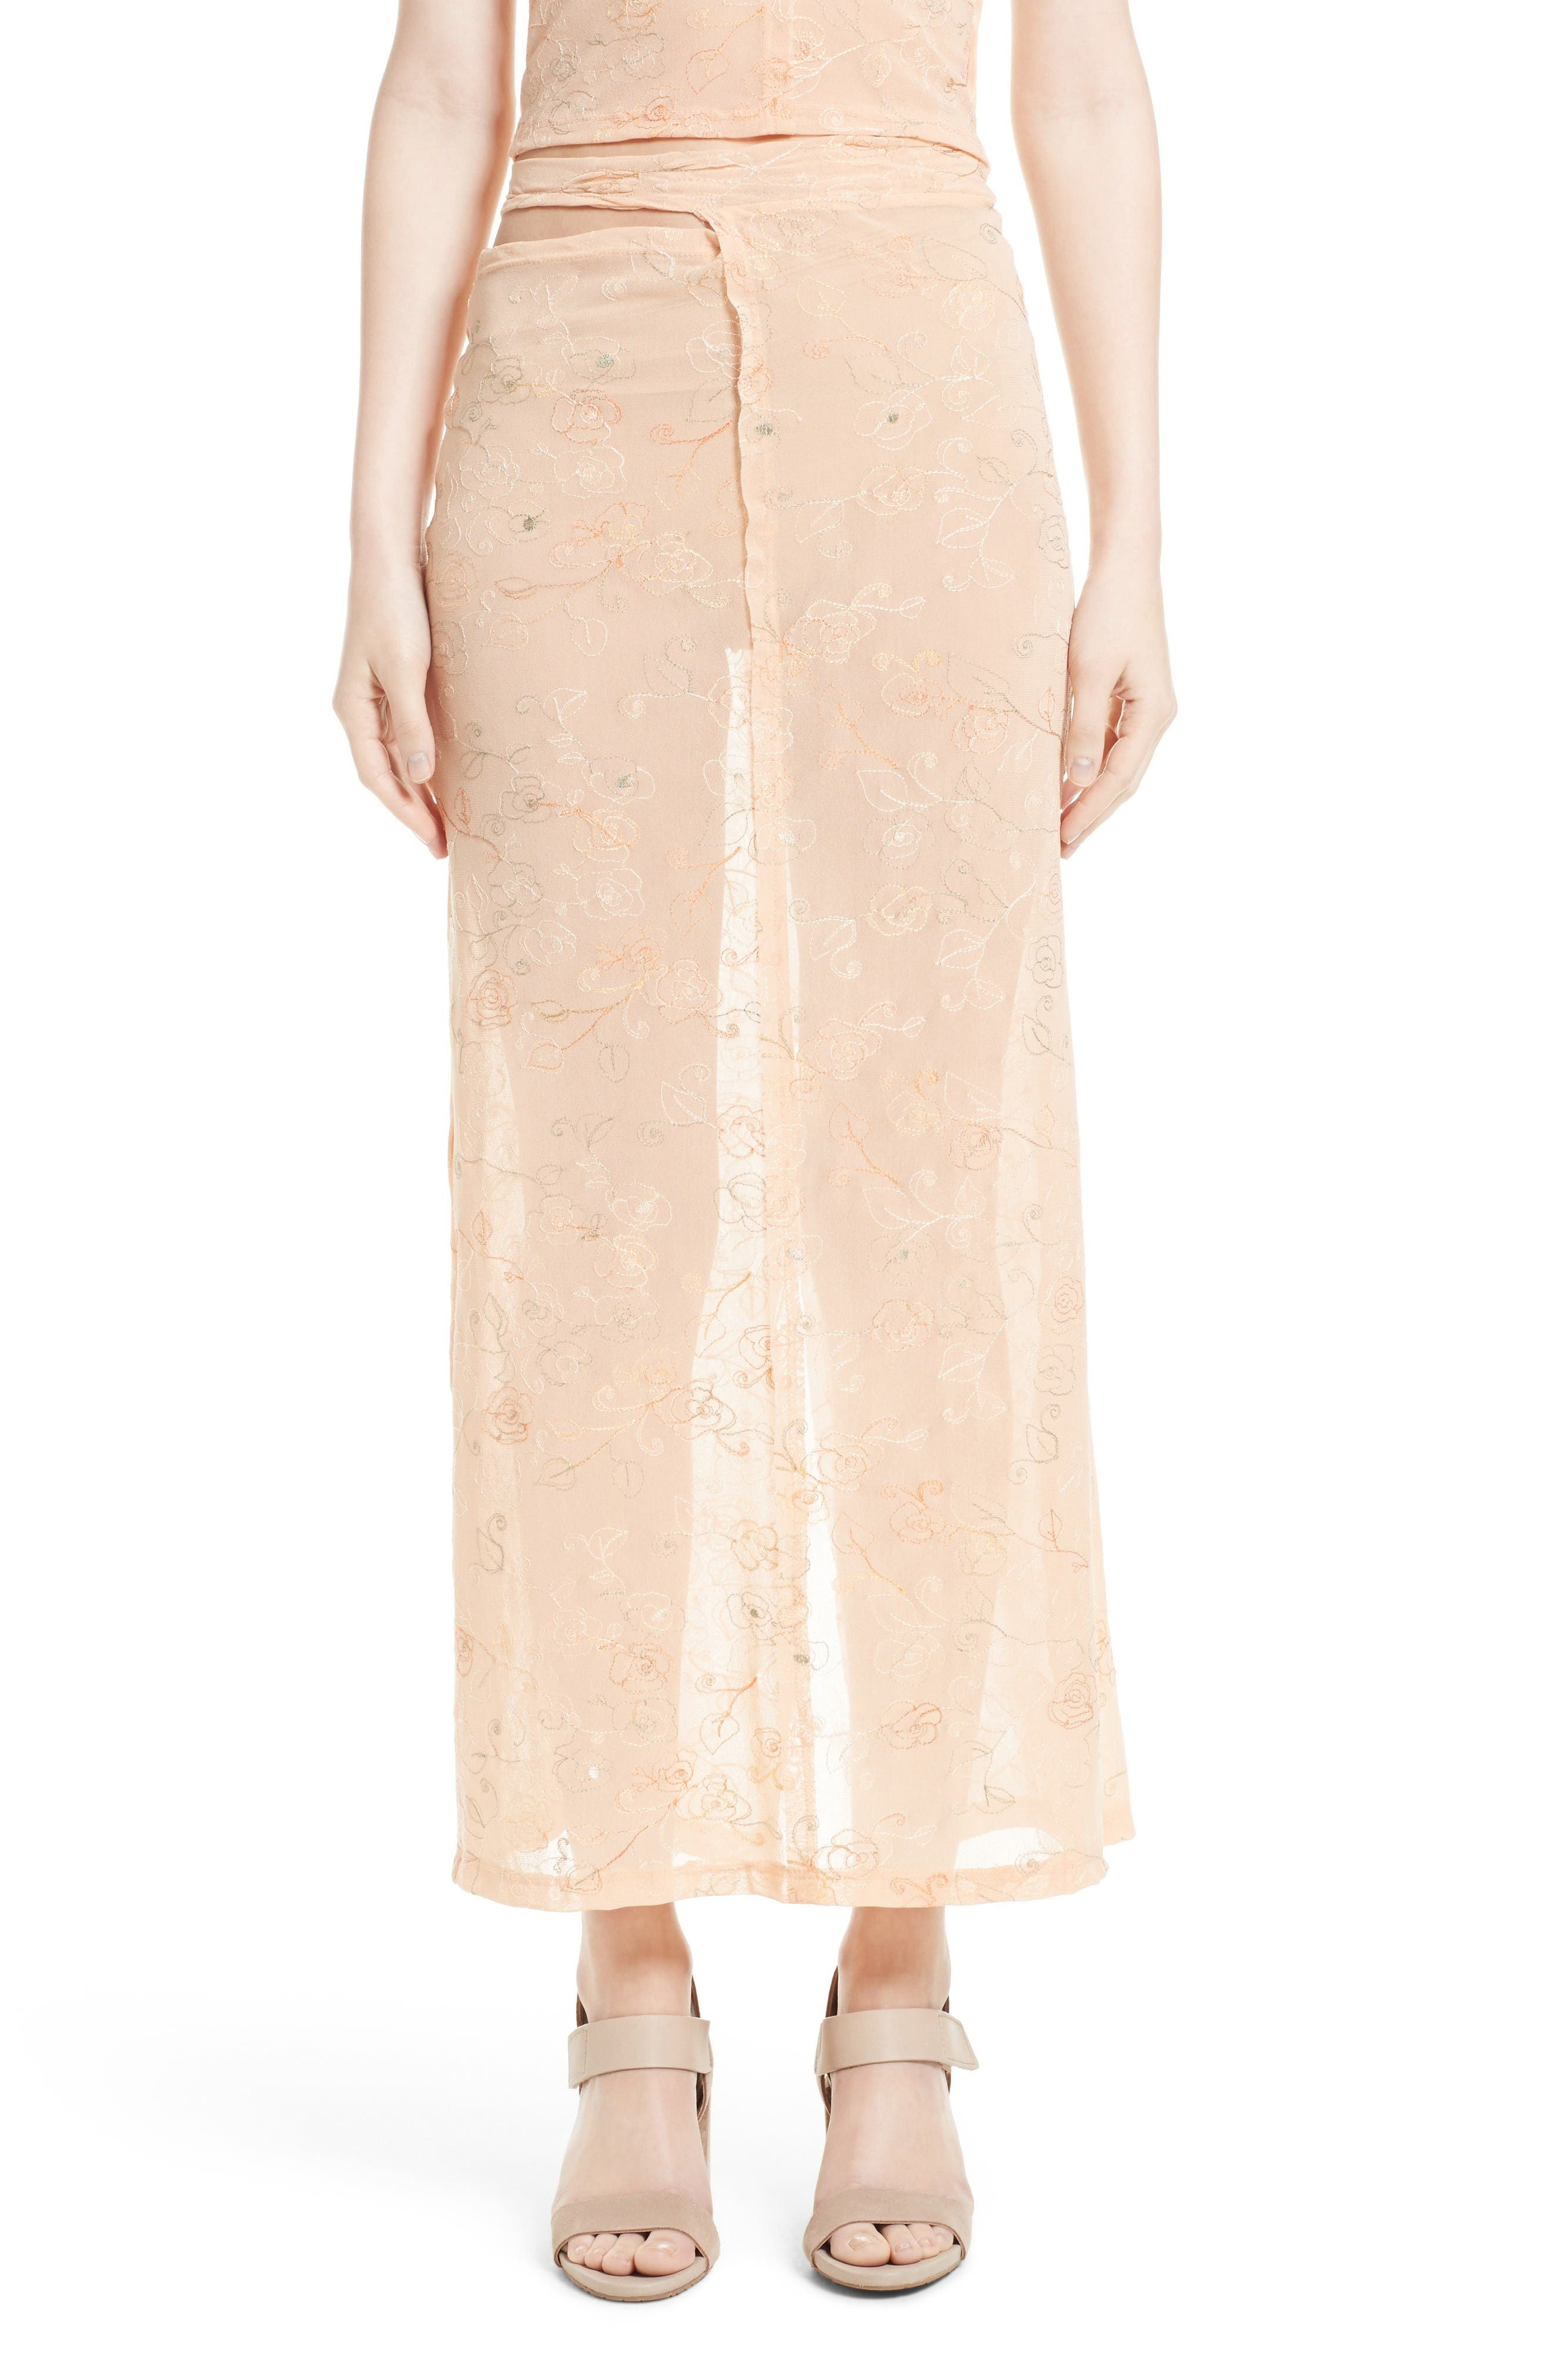 ECKHAUS LATTA Embroidered Midi Skirt